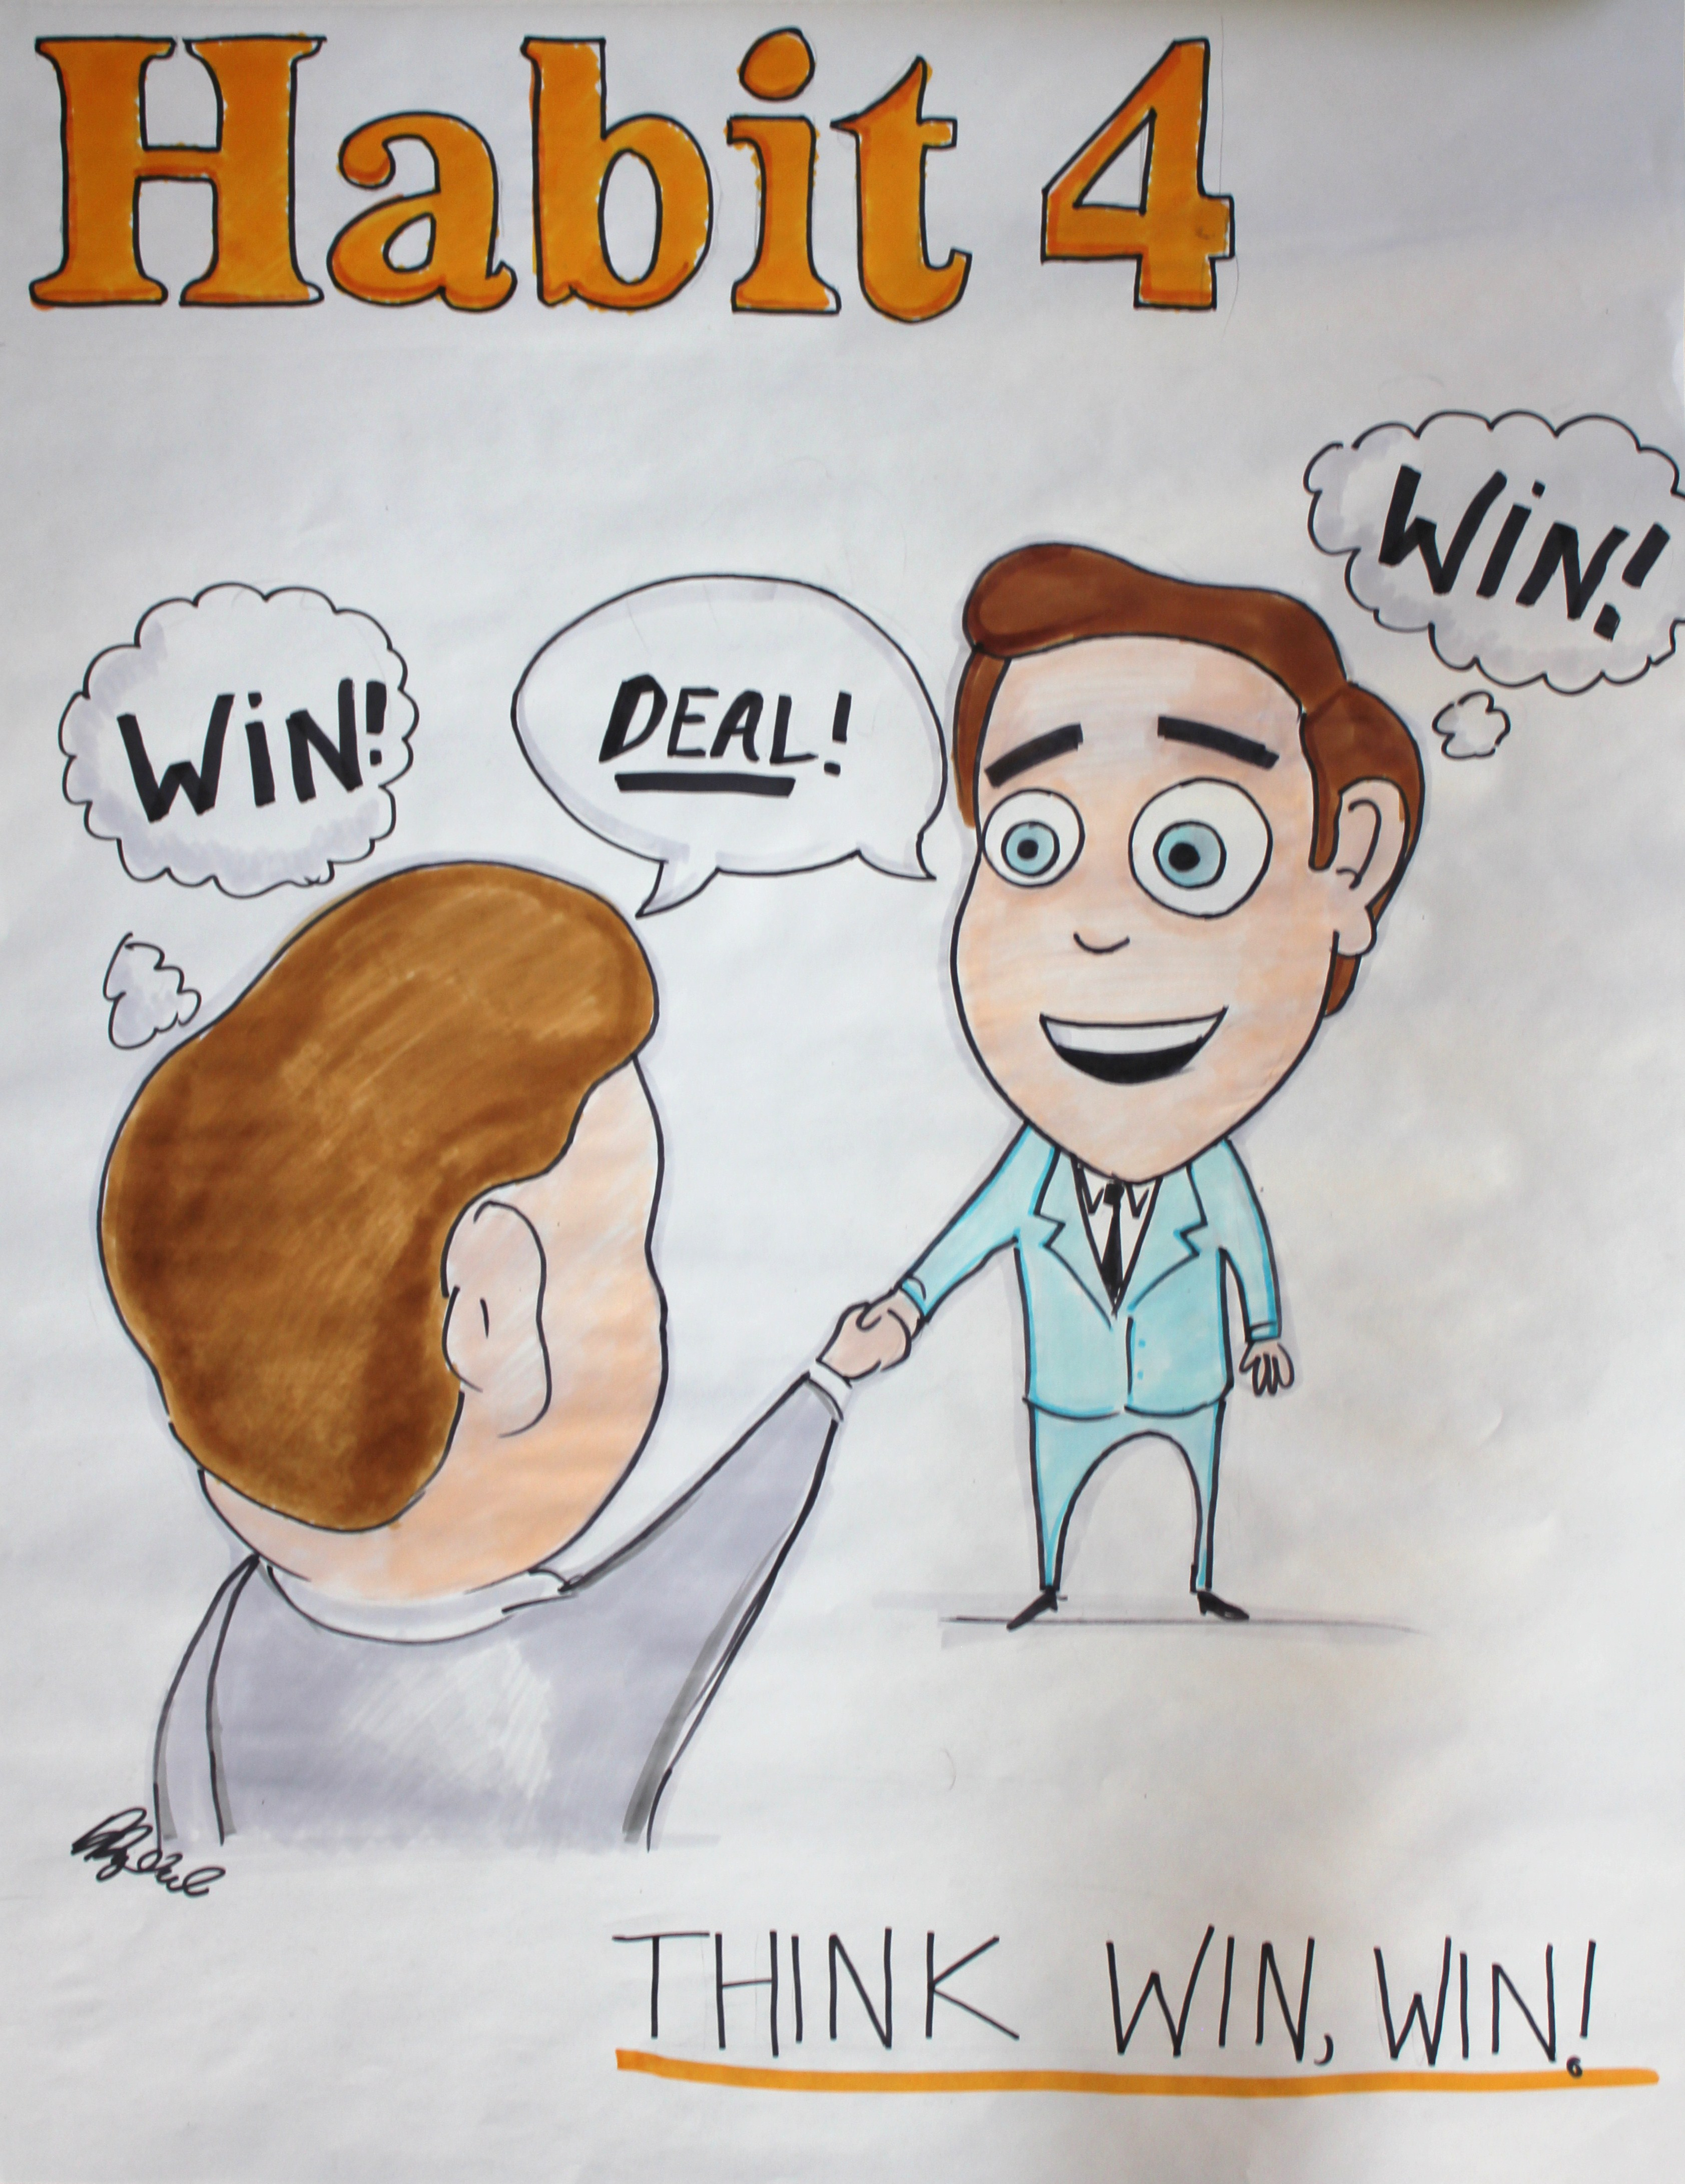 7 Habits Worksheet Habit 4